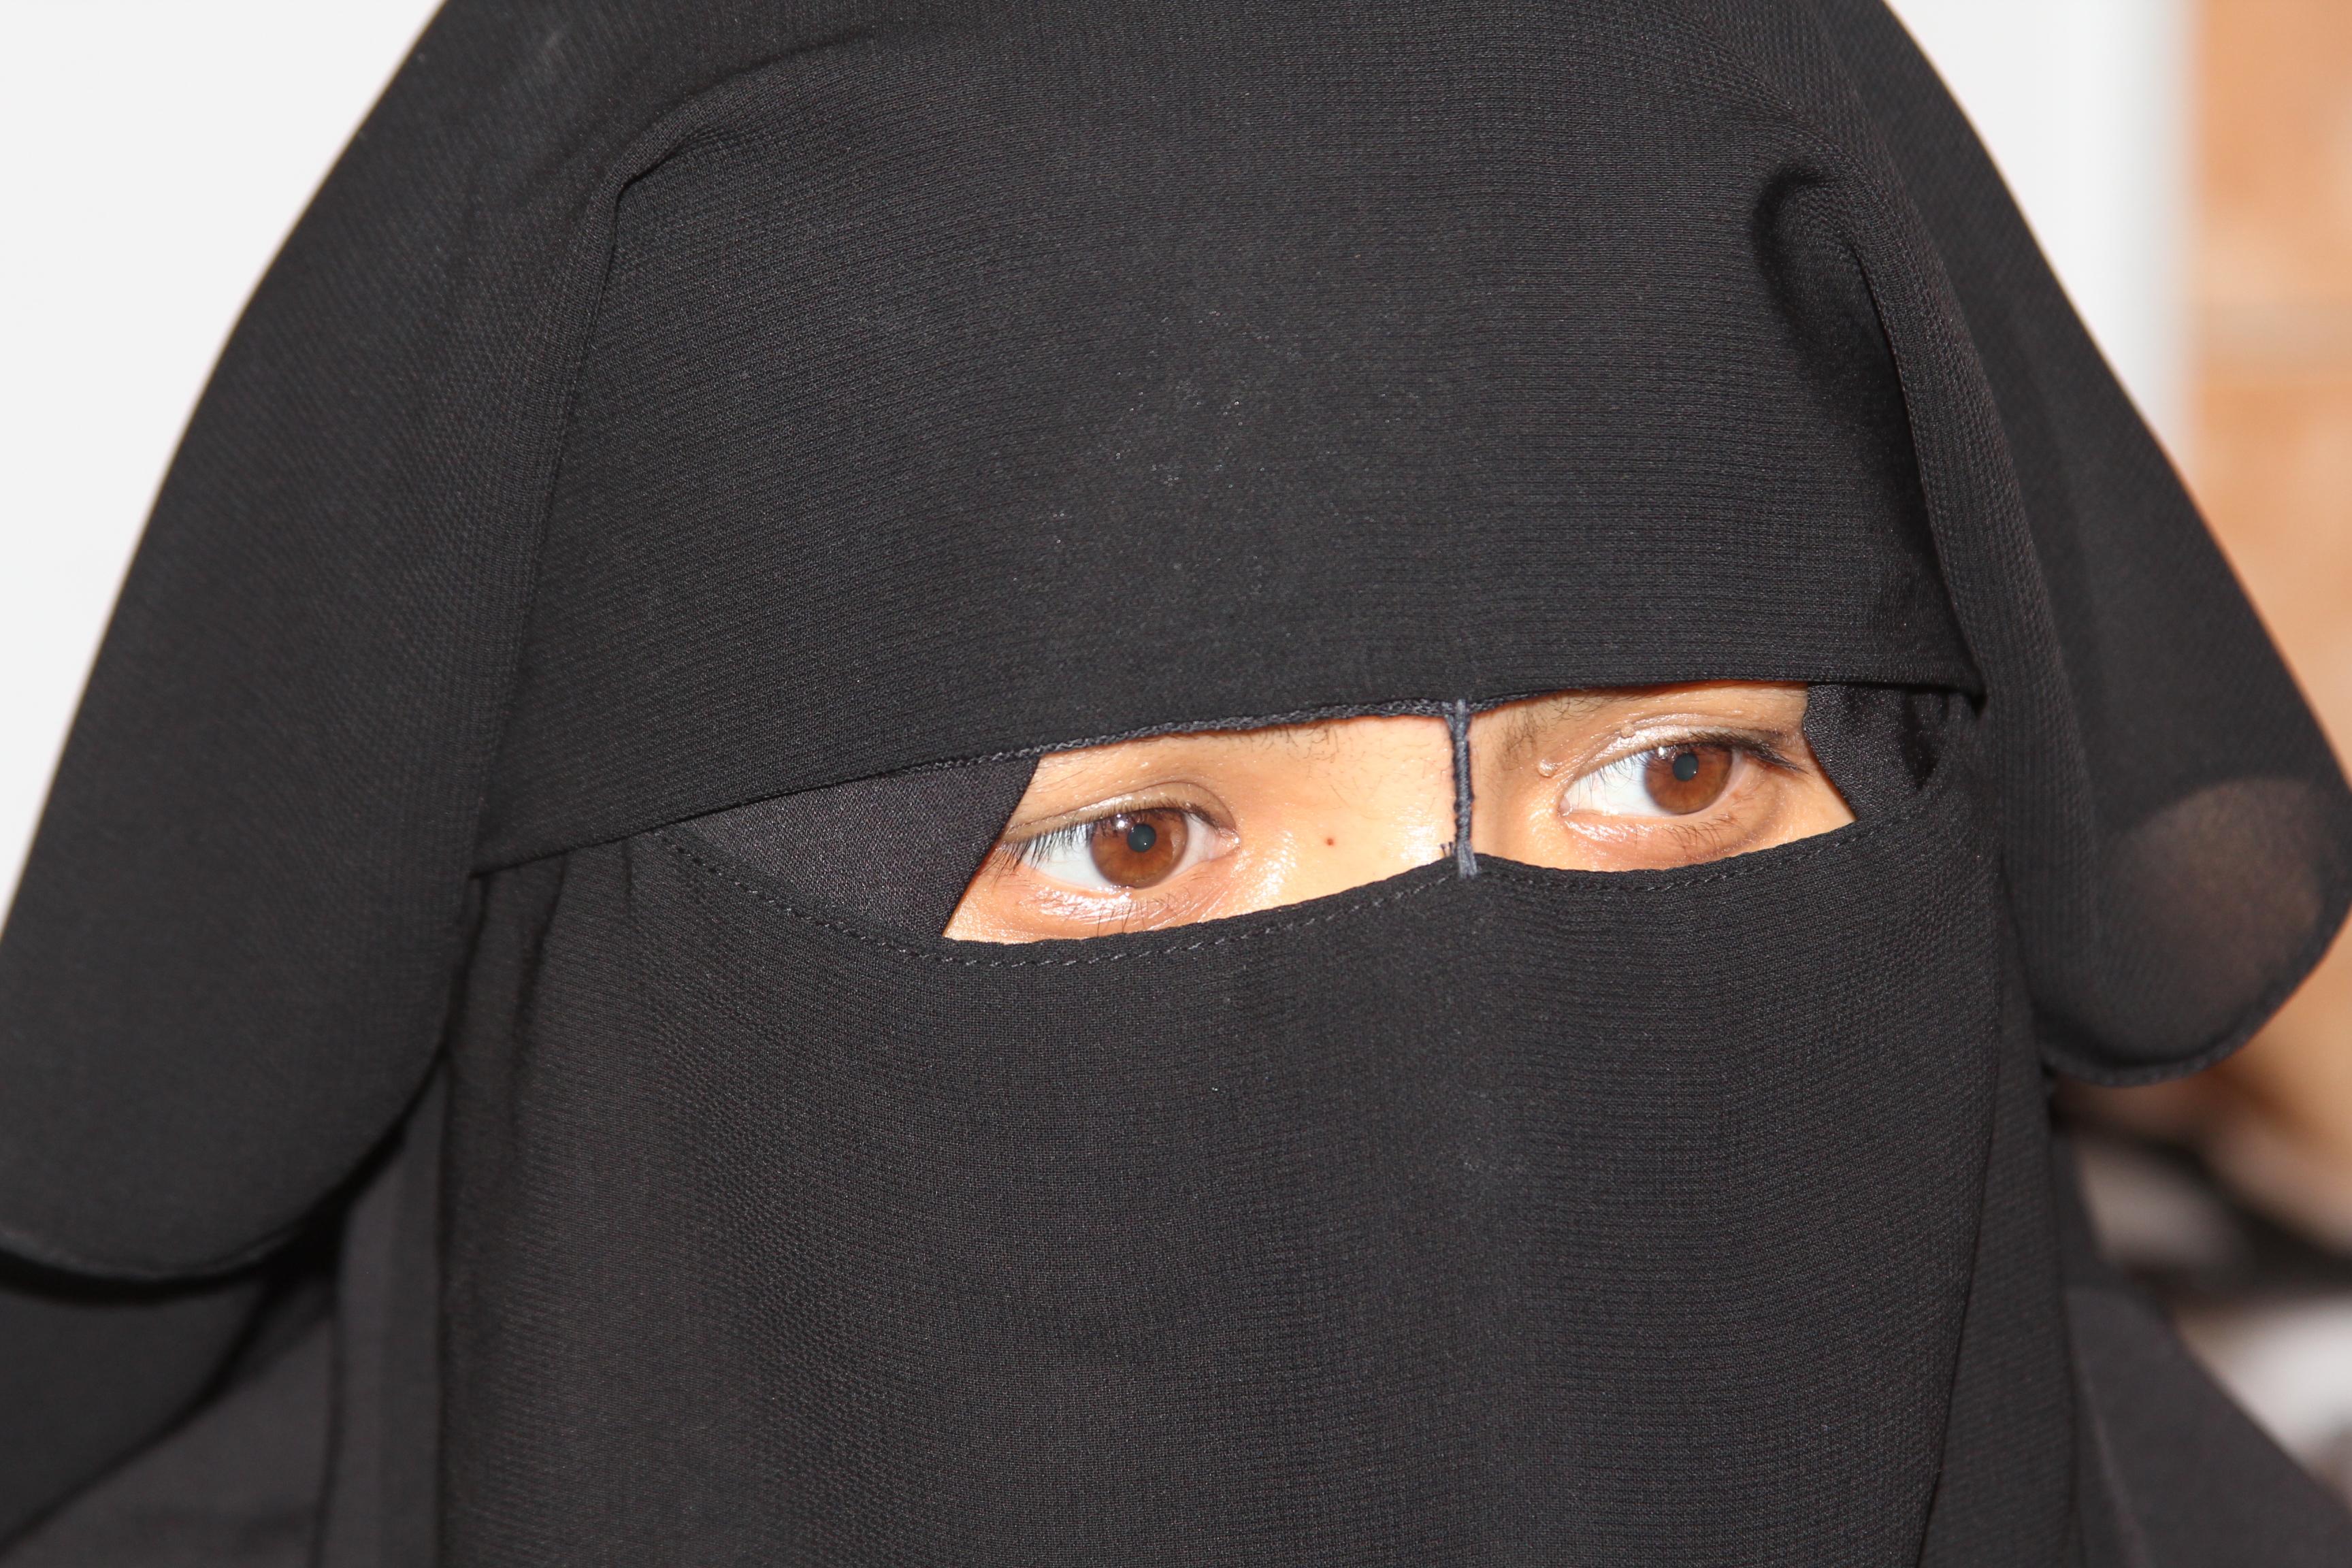 Kazakhstan battles female radicalisation